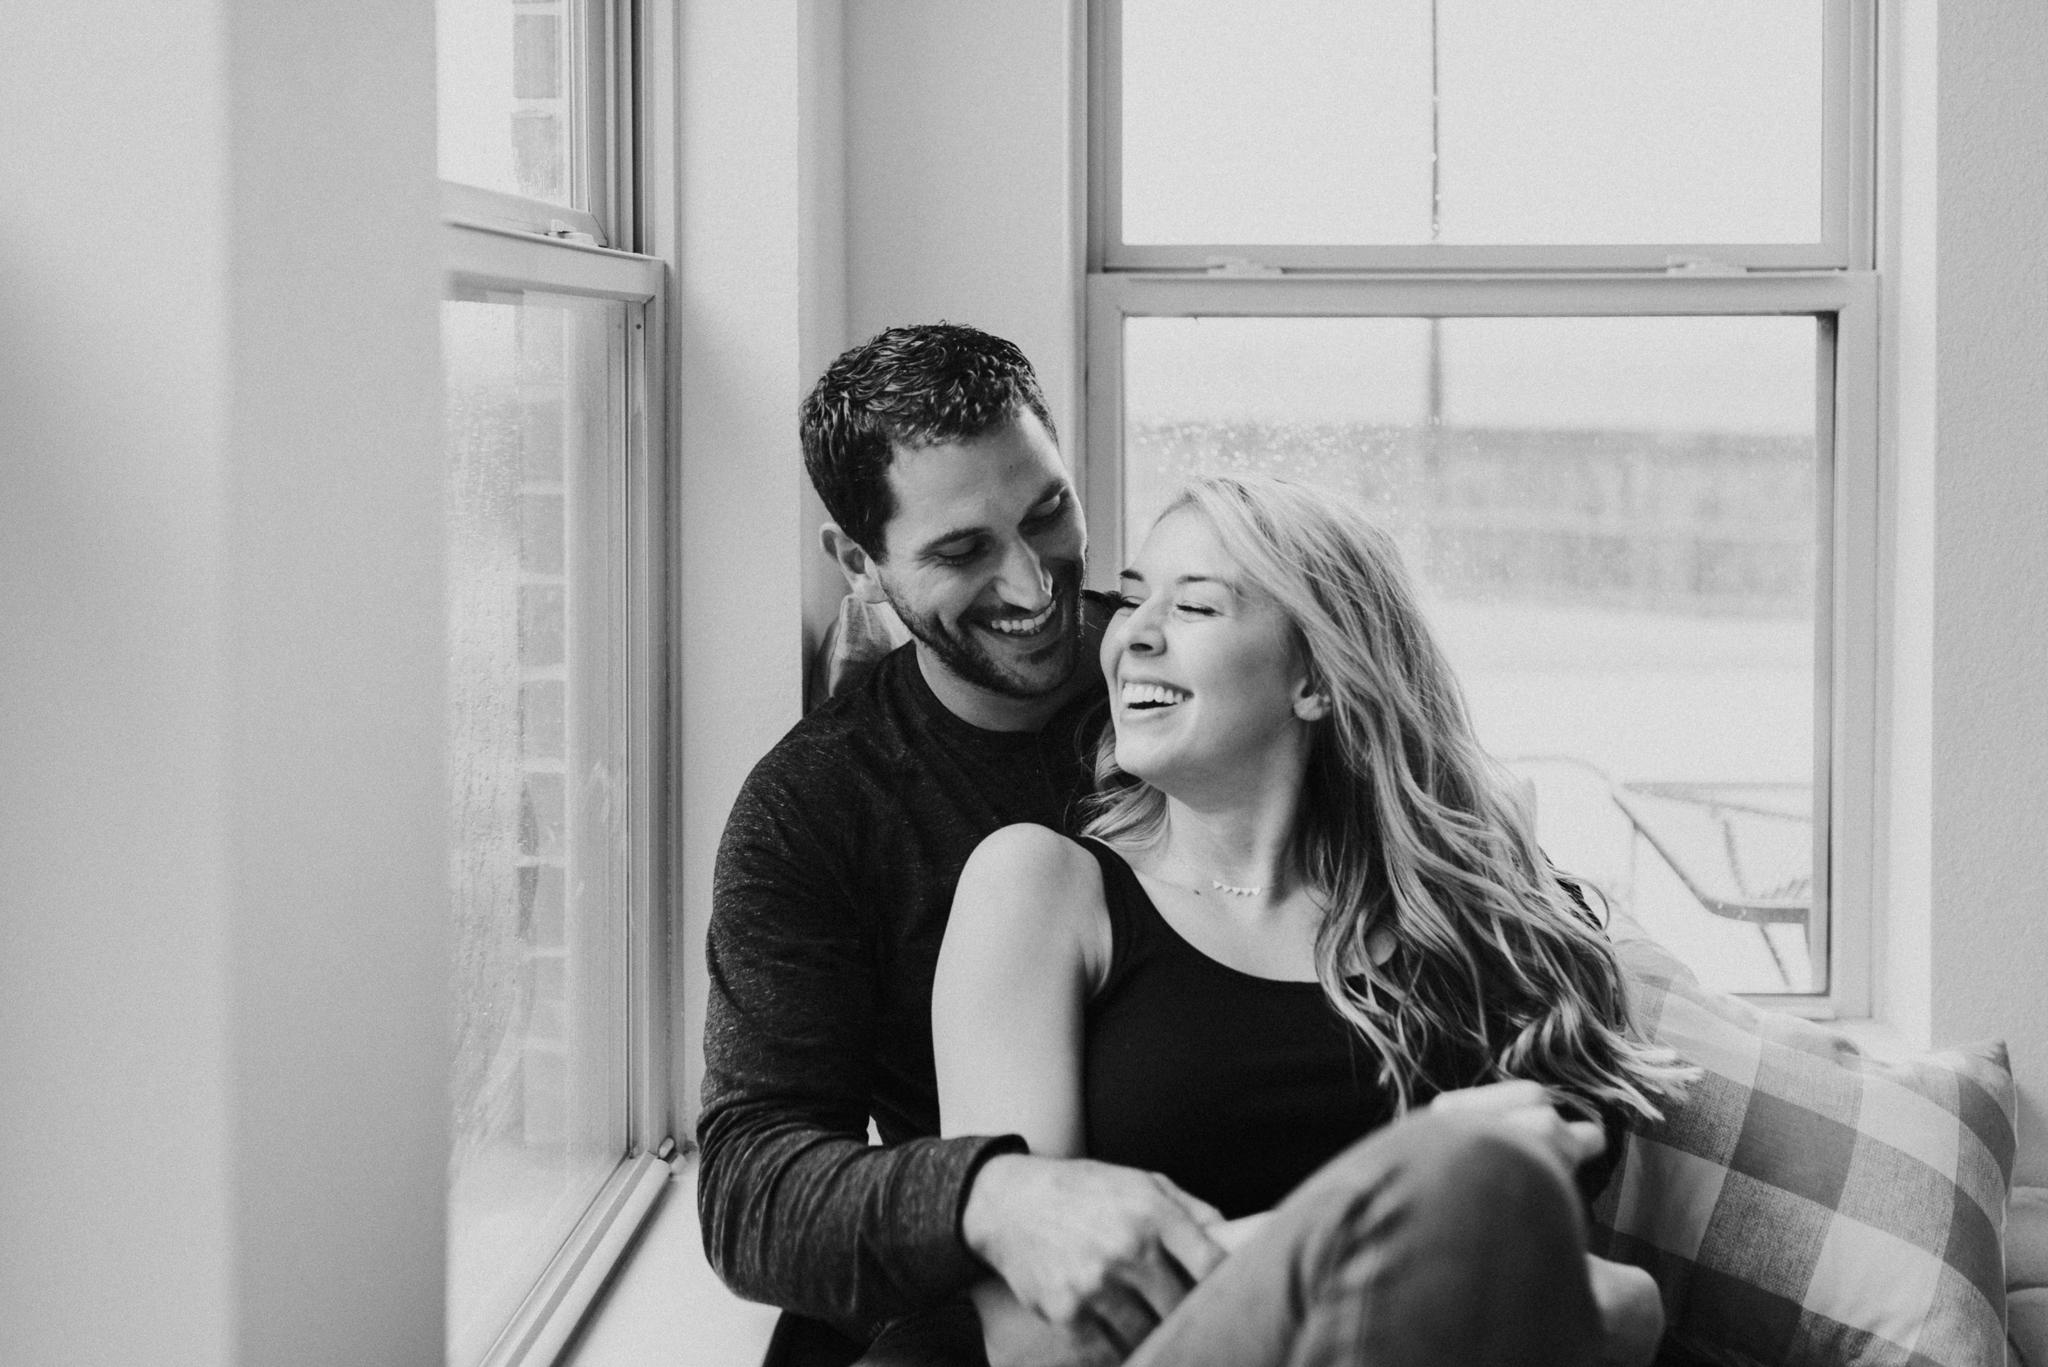 Houston Wedding Photographer-Houston In Home Engagement Session- Houston Wedding Photographer -Kristen Giles Photography-93.jpg